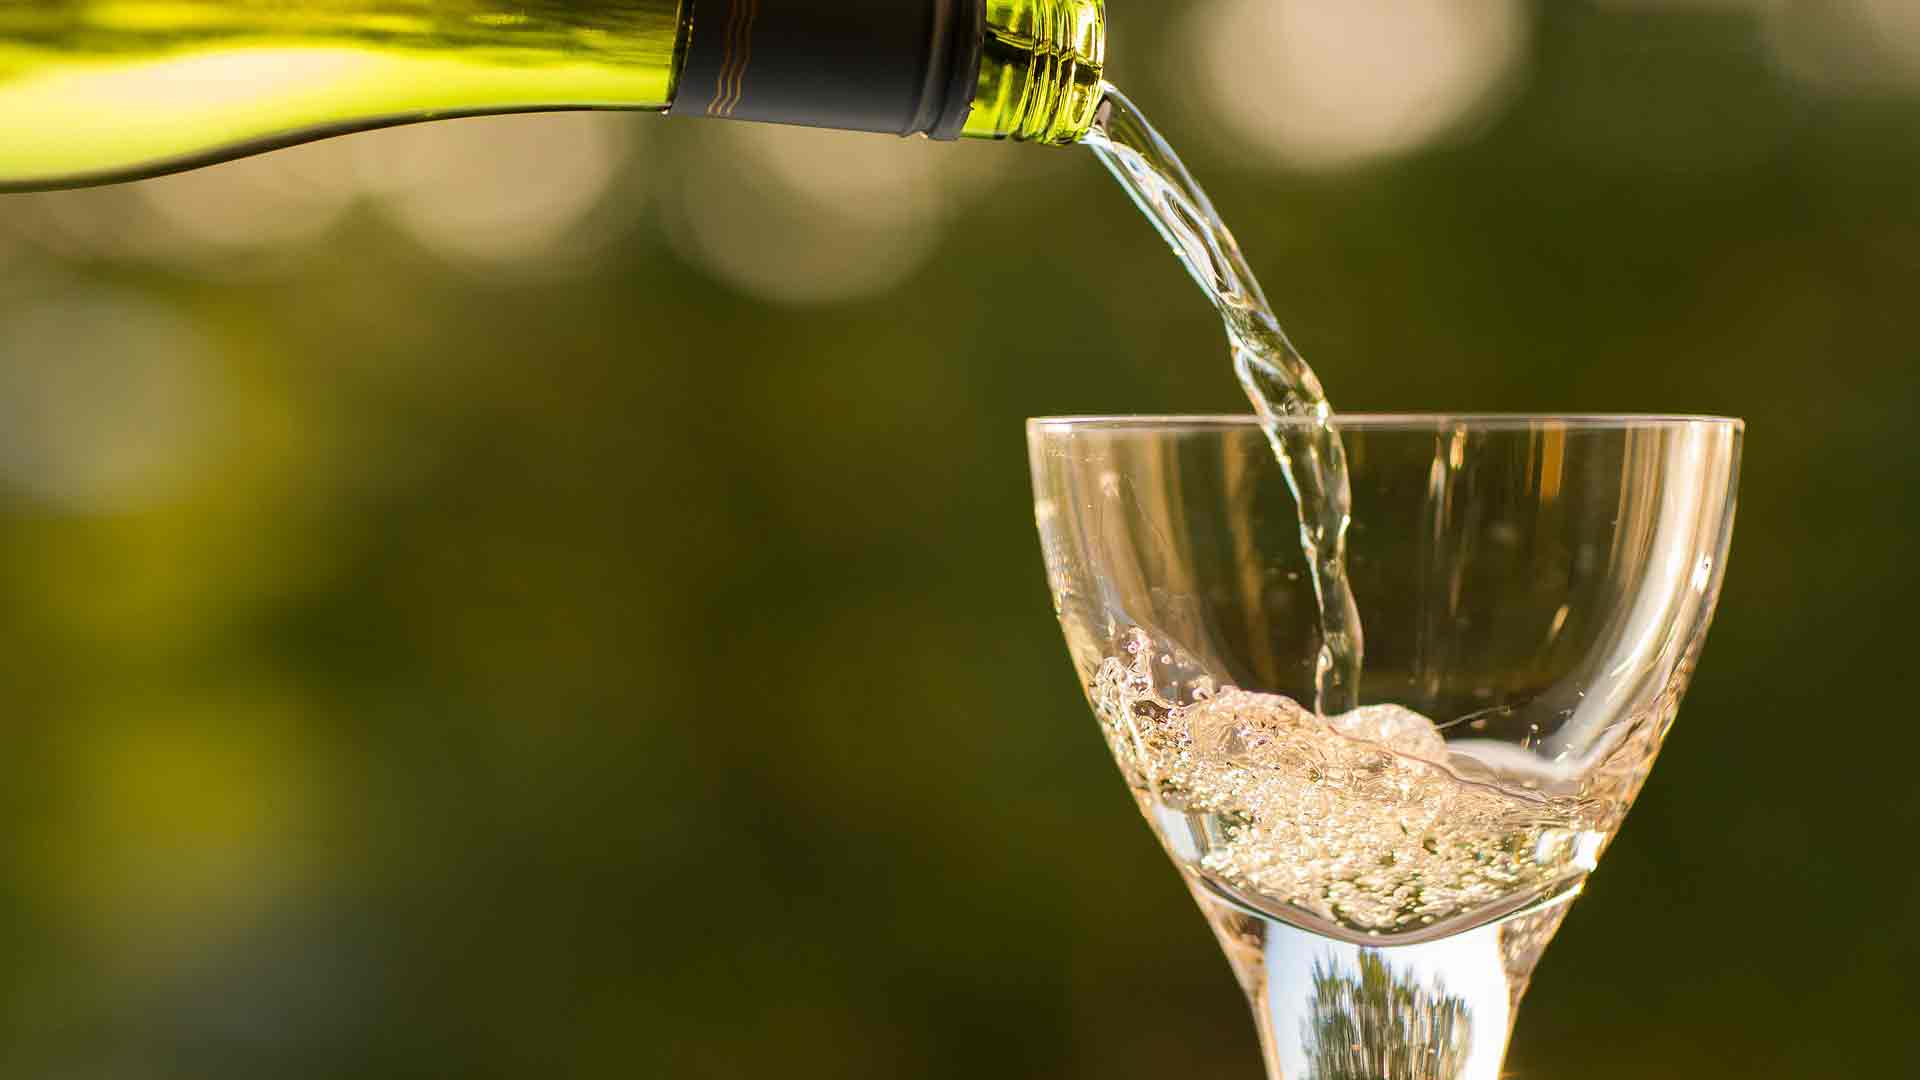 10-bebidas-alcohólicas-aptas-para-personas-celíacas-1920